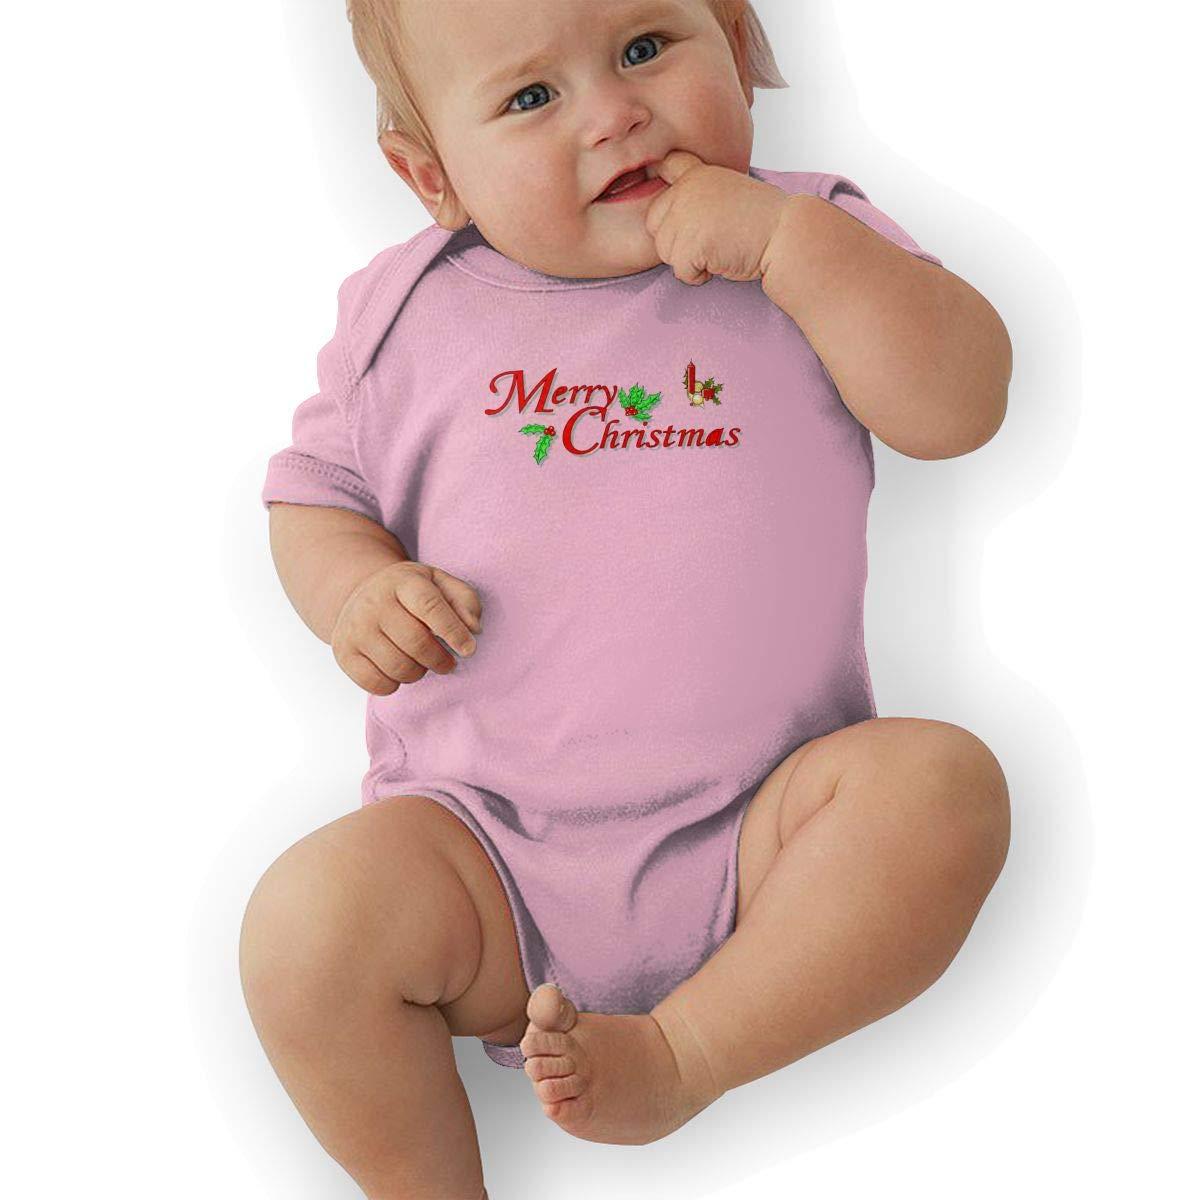 HappyLifea Merry Christmas Newborn Baby Short Sleeve Romper Infant Summer Clothing